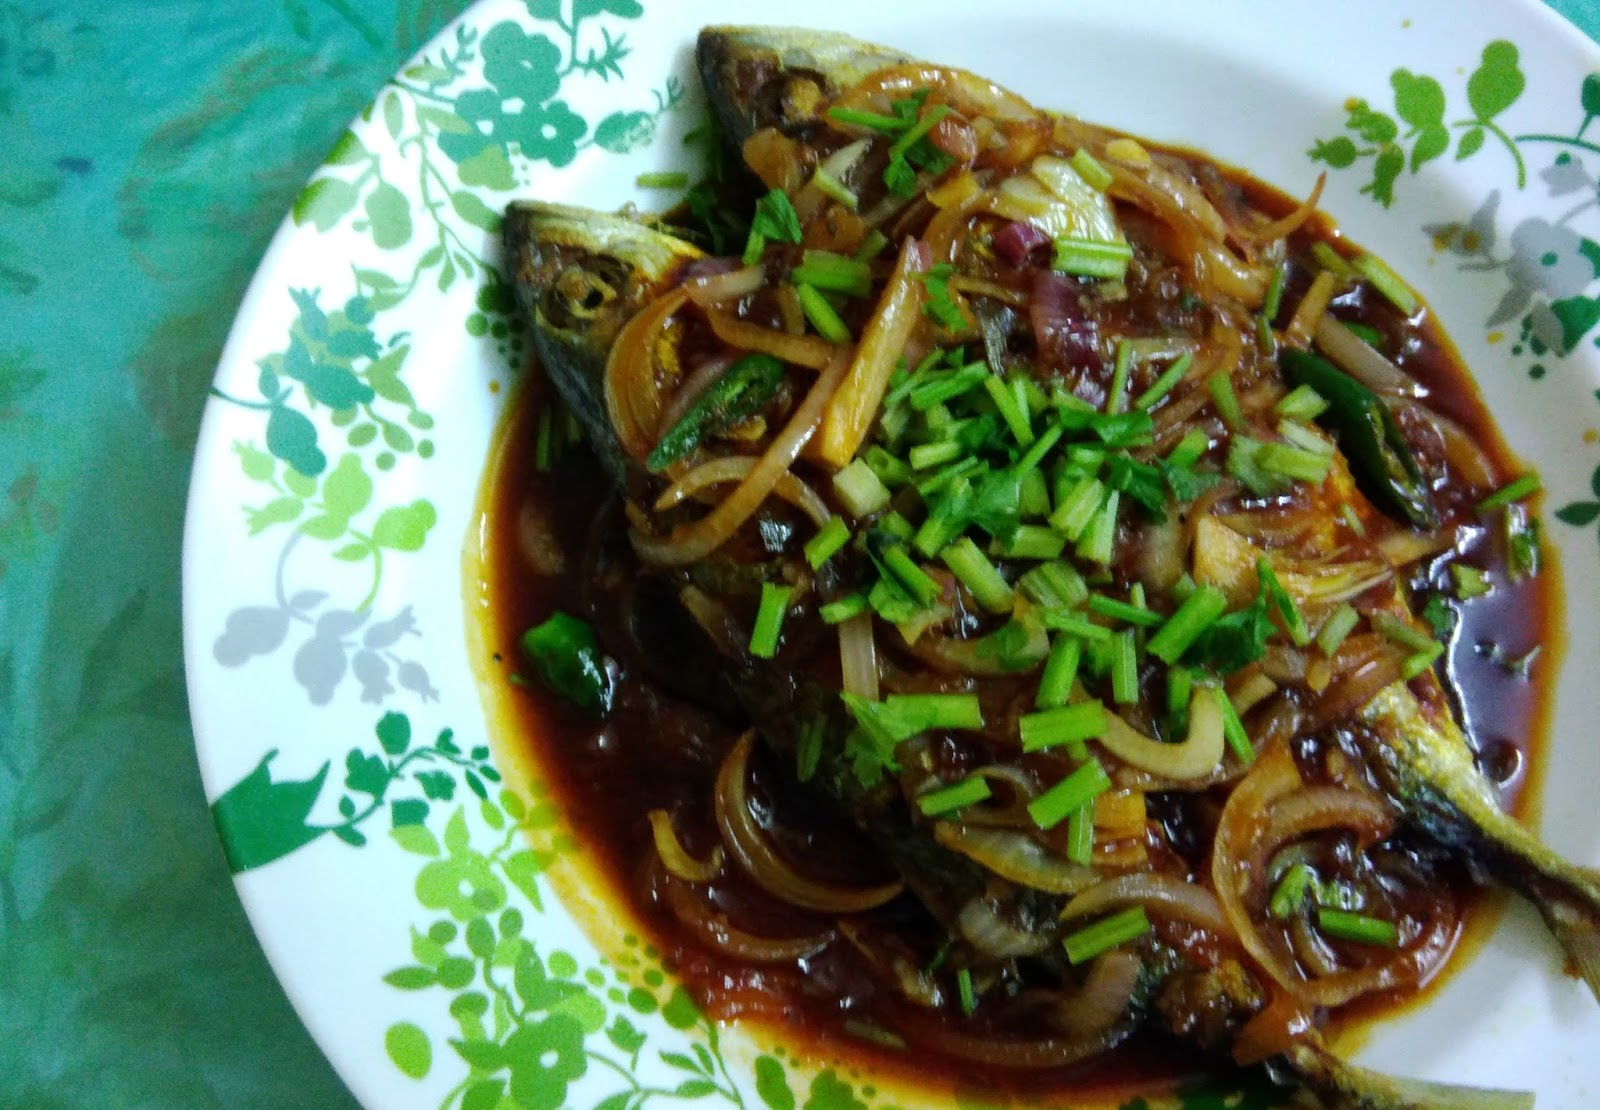 Resepi Ikan Goreng Kicap Simple - Resep Bunda Erita